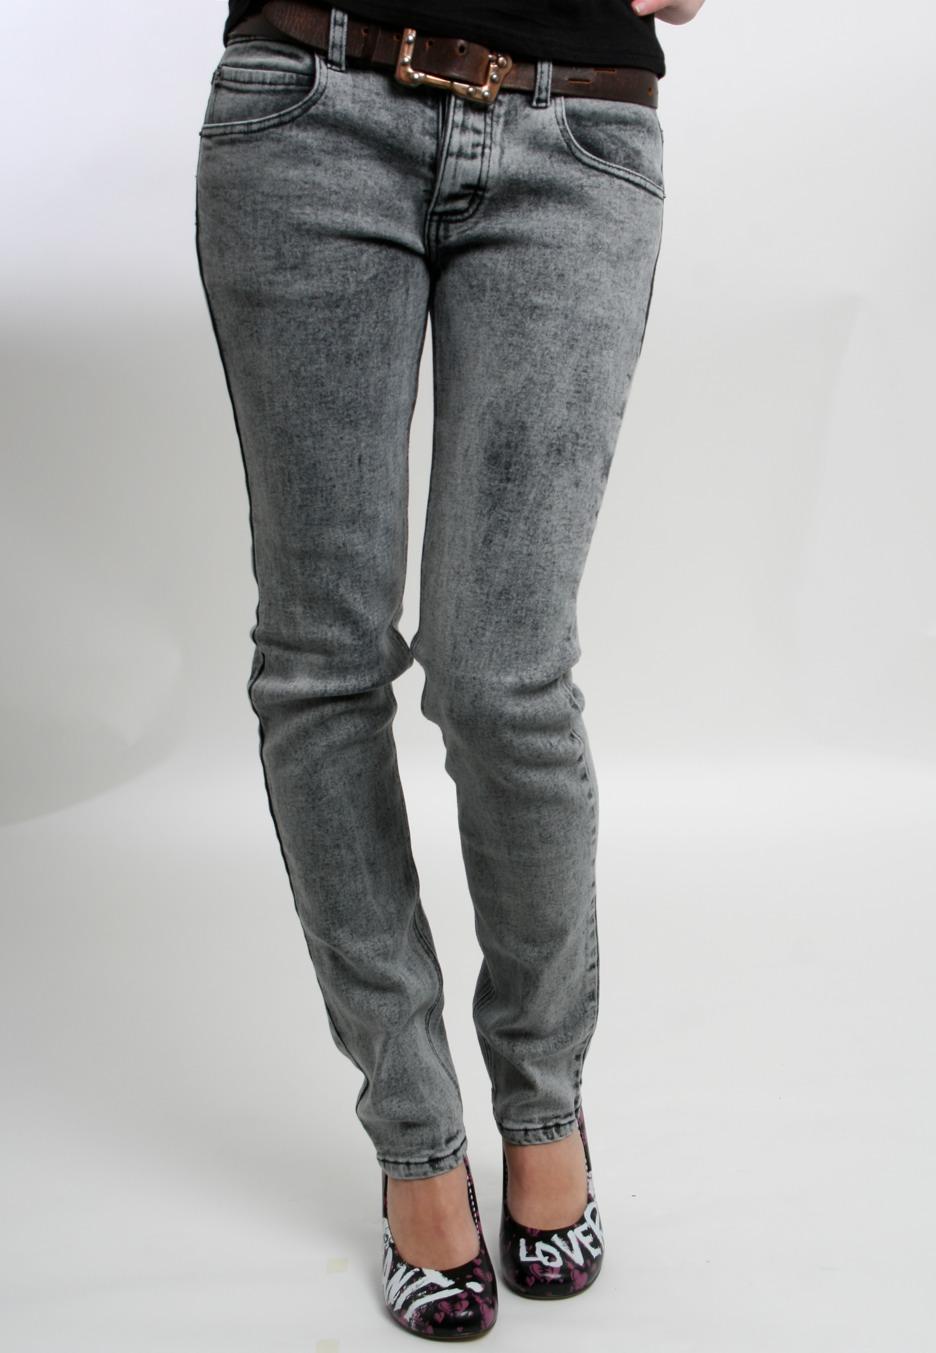 Cheap Monday - Narrow Used Black - Girl Jeans - Impericon.com UK